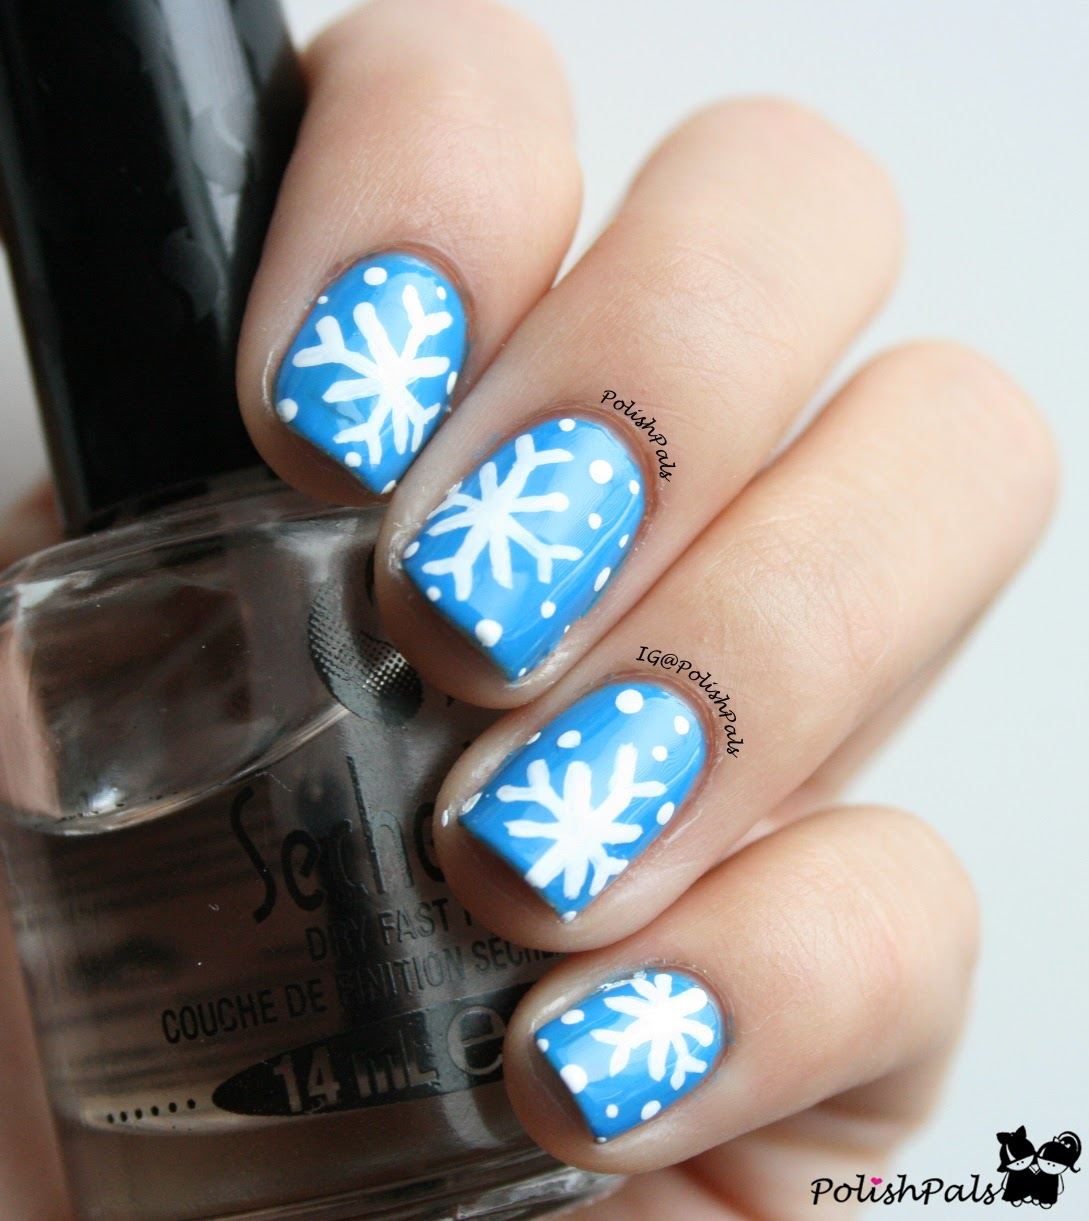 Snowflake Nail Art Tutorial: Polish Pals: Easiest Snowflake Tutorial